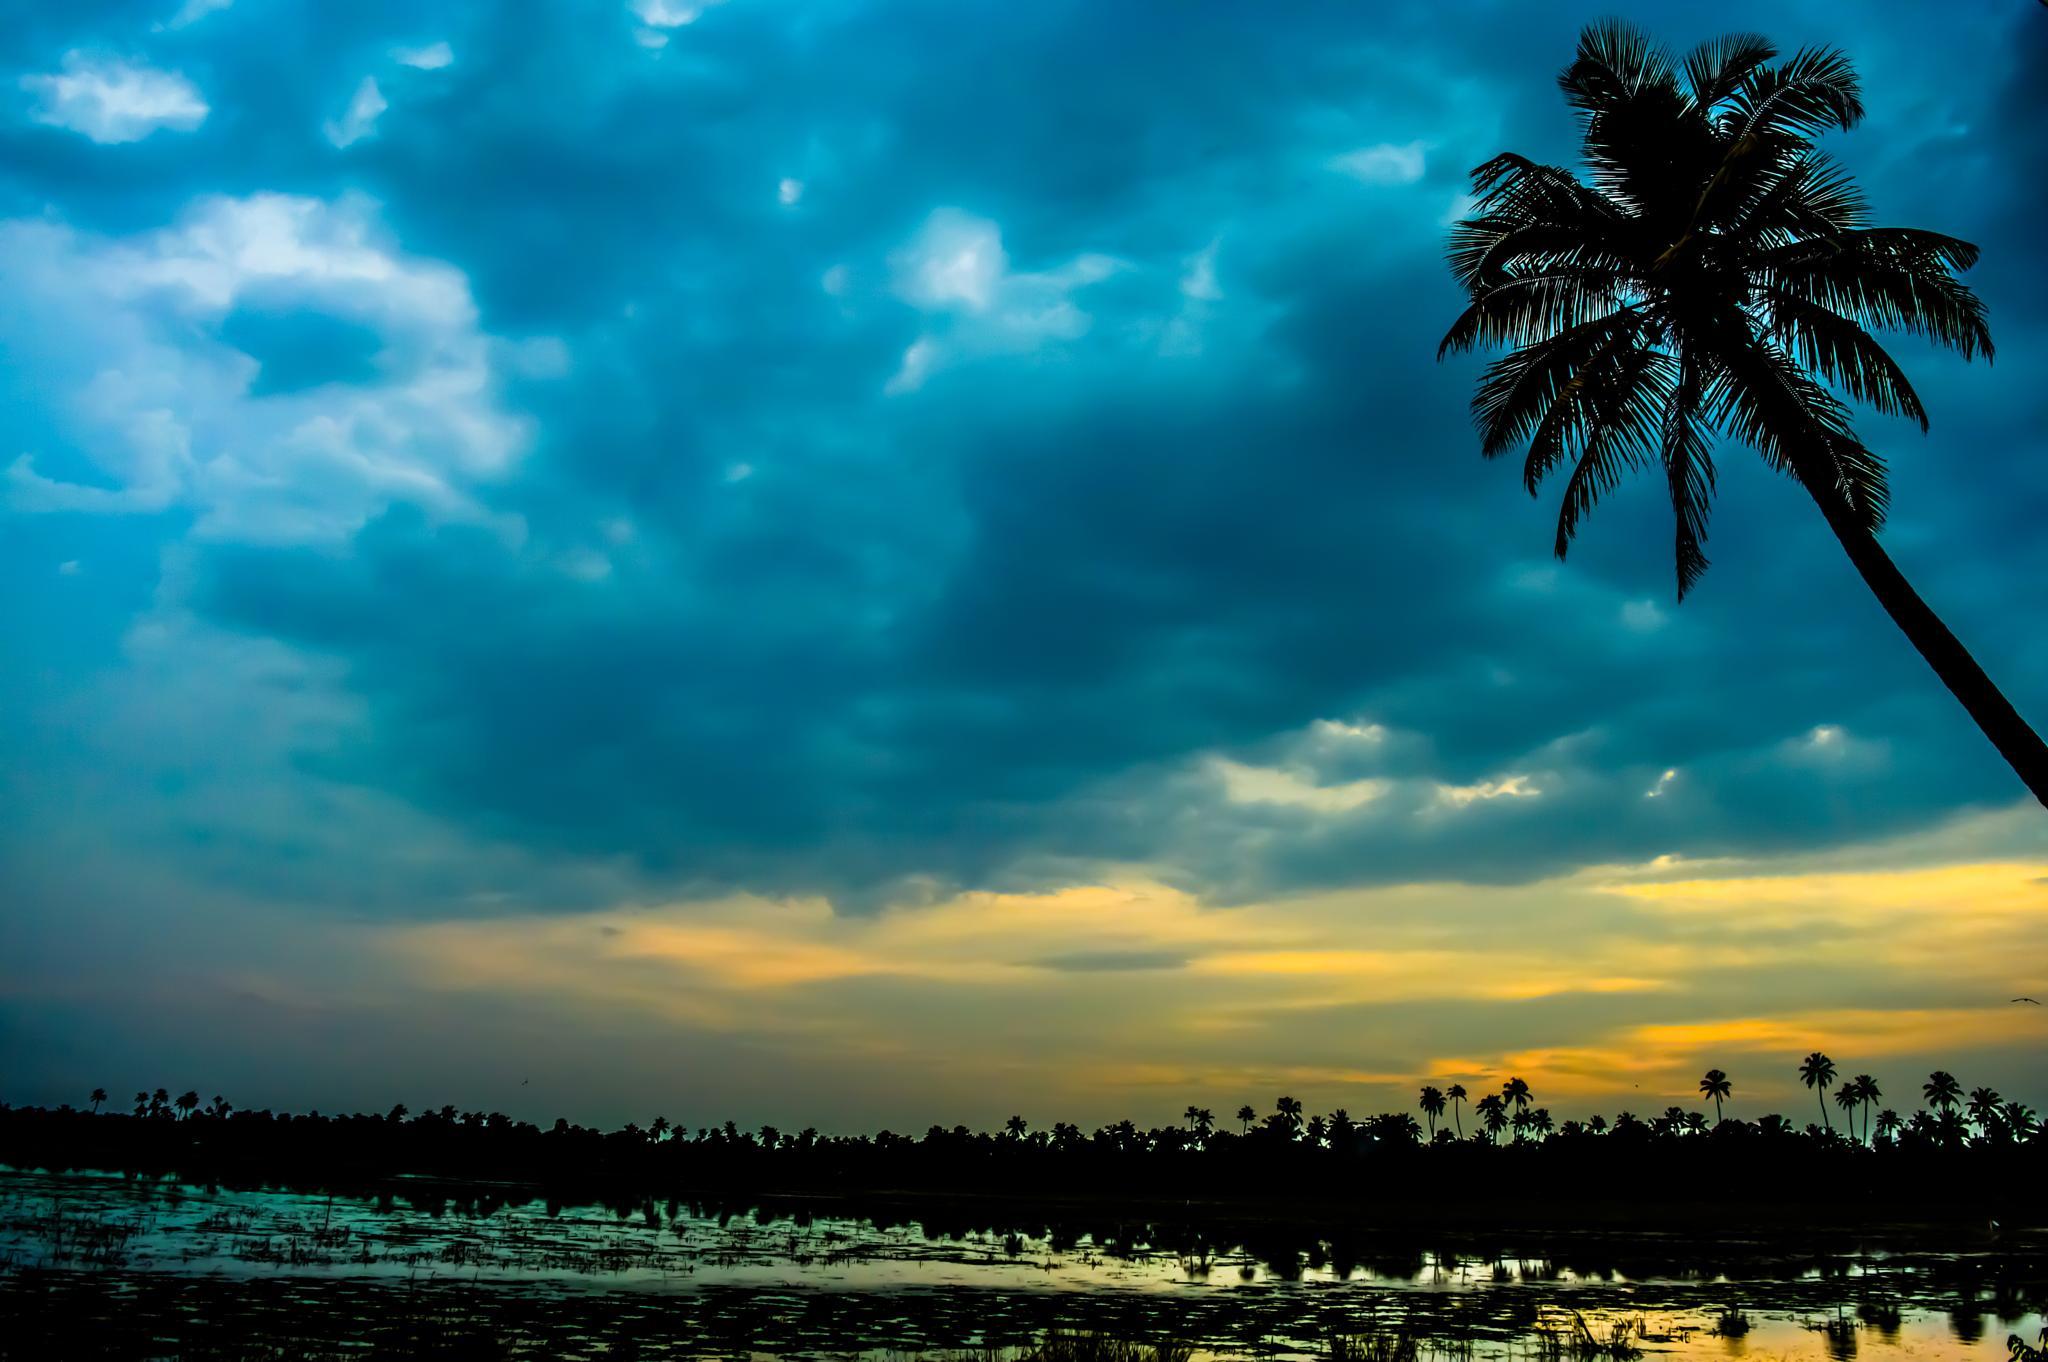 Sunset by HABEEB RAHMAN